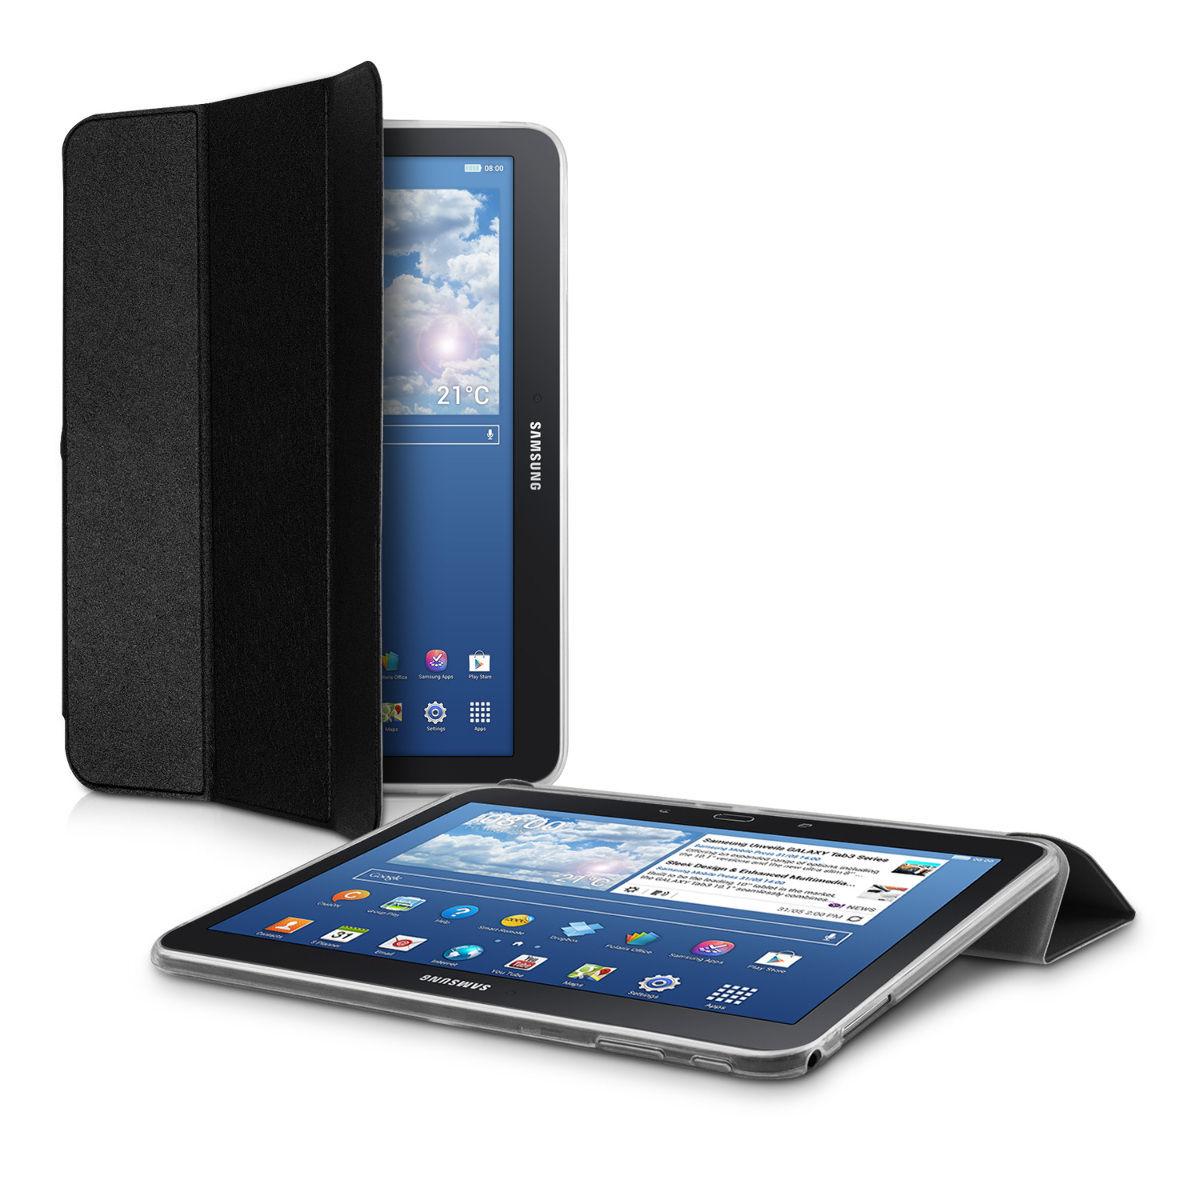 Pouzdro pro Samsung Galaxy Tab 4 10.1 T535 černé